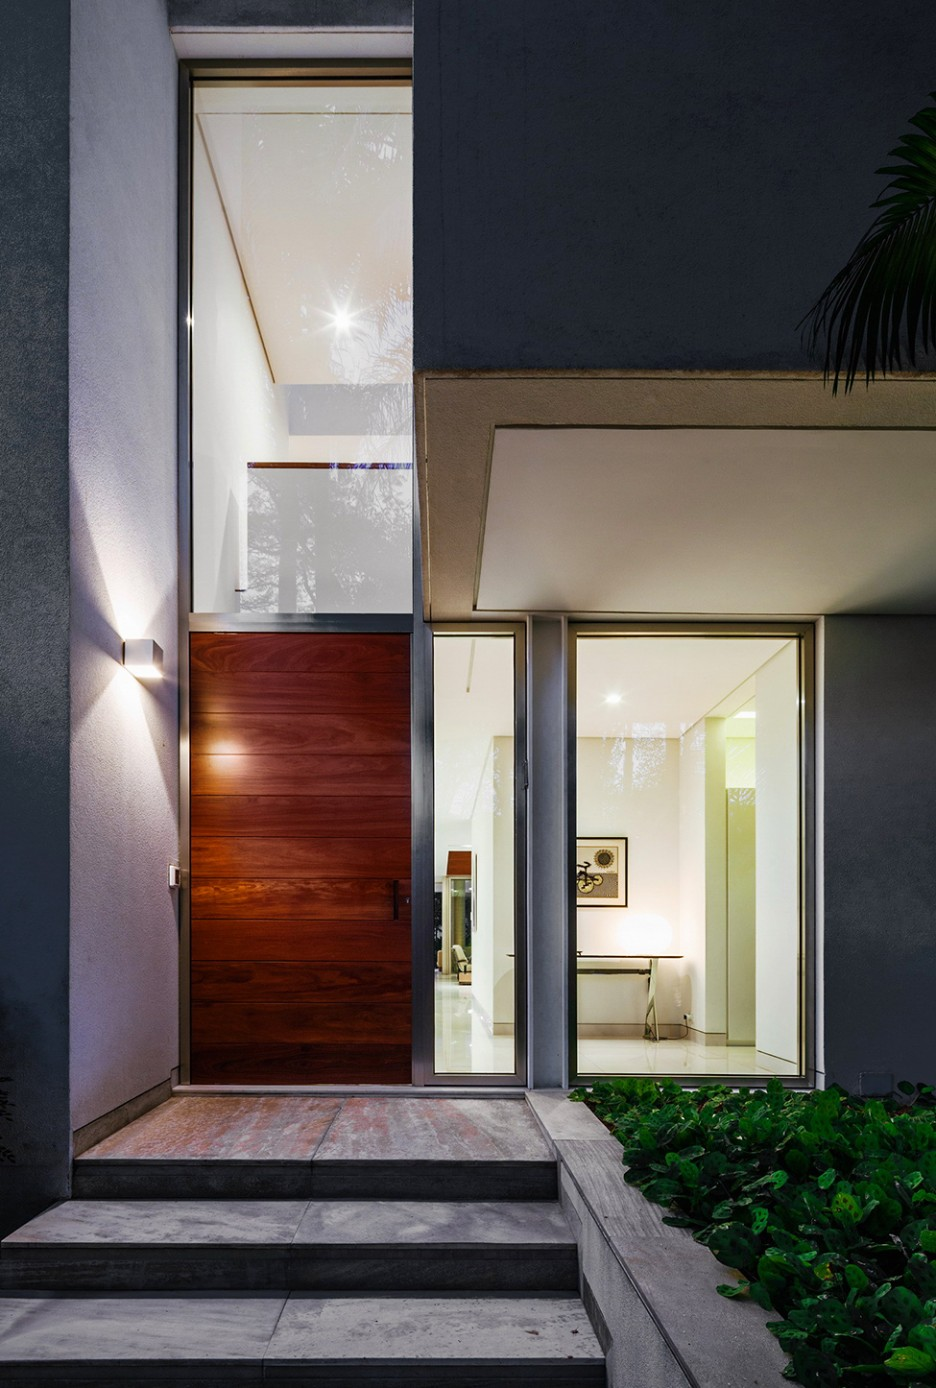 403 forbidden for Window design concrete